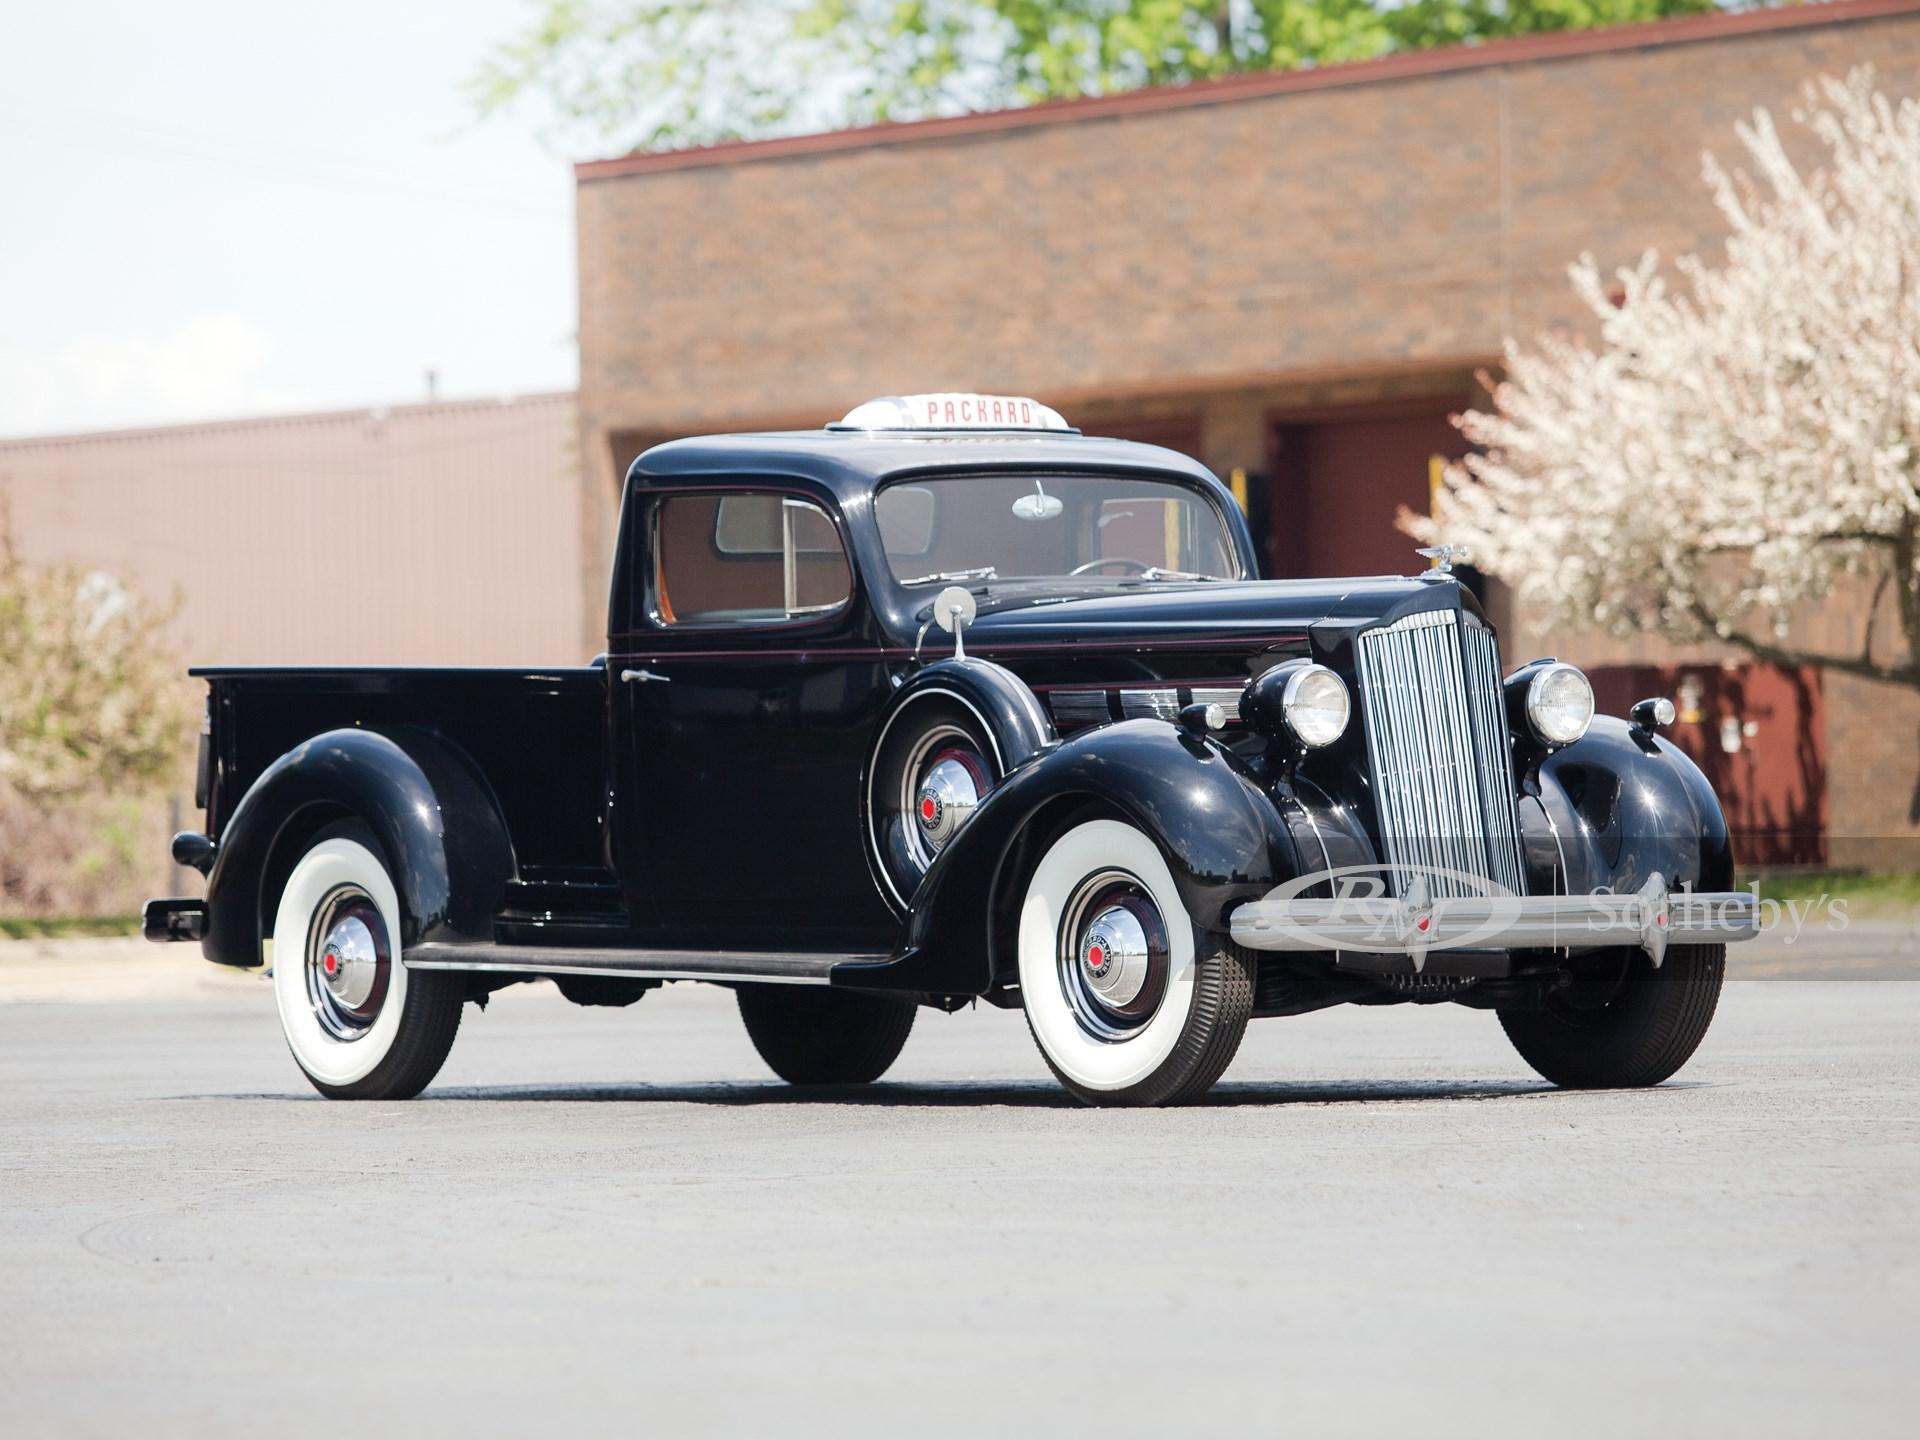 1937 Packard One Twenty Pickup